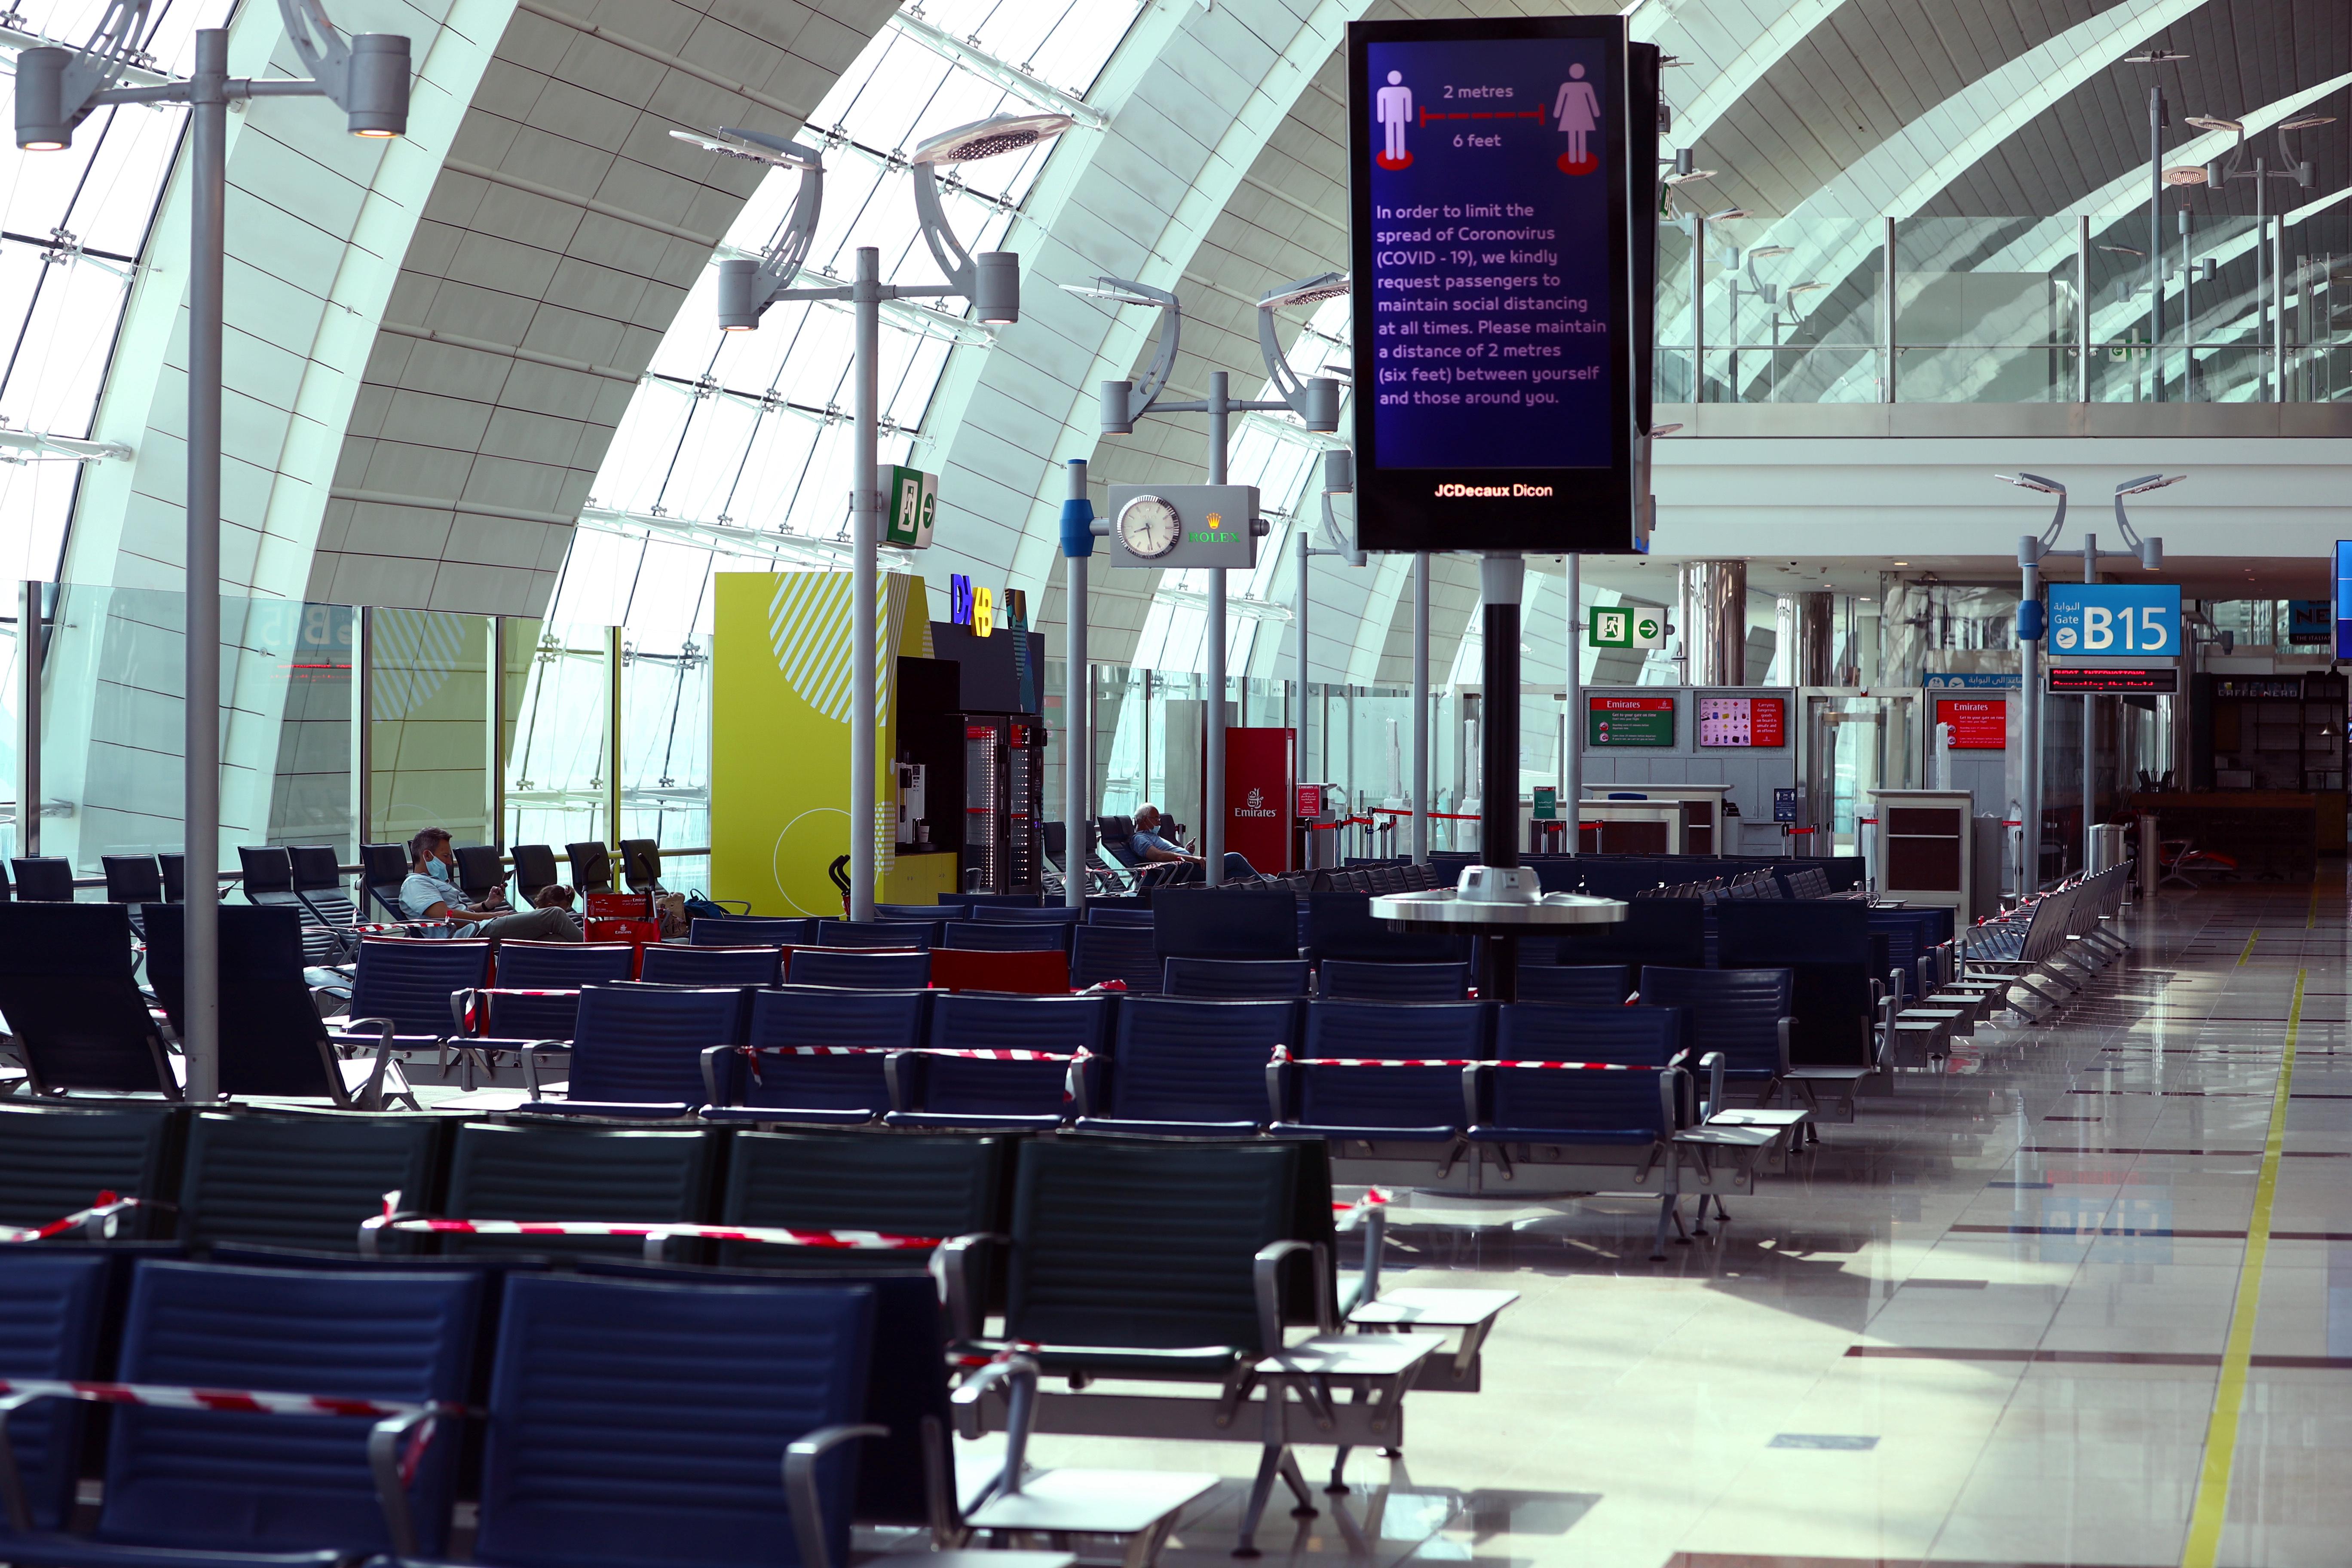 Passengers wait before boarding at Dubai International Airport, as Emirates airline resumed limited outbound passenger flights amid outbreak of the coronavirus disease (COVID-19) in Dubai, UAE April 27, 2020. REUTERS/Ahmed Jadallah